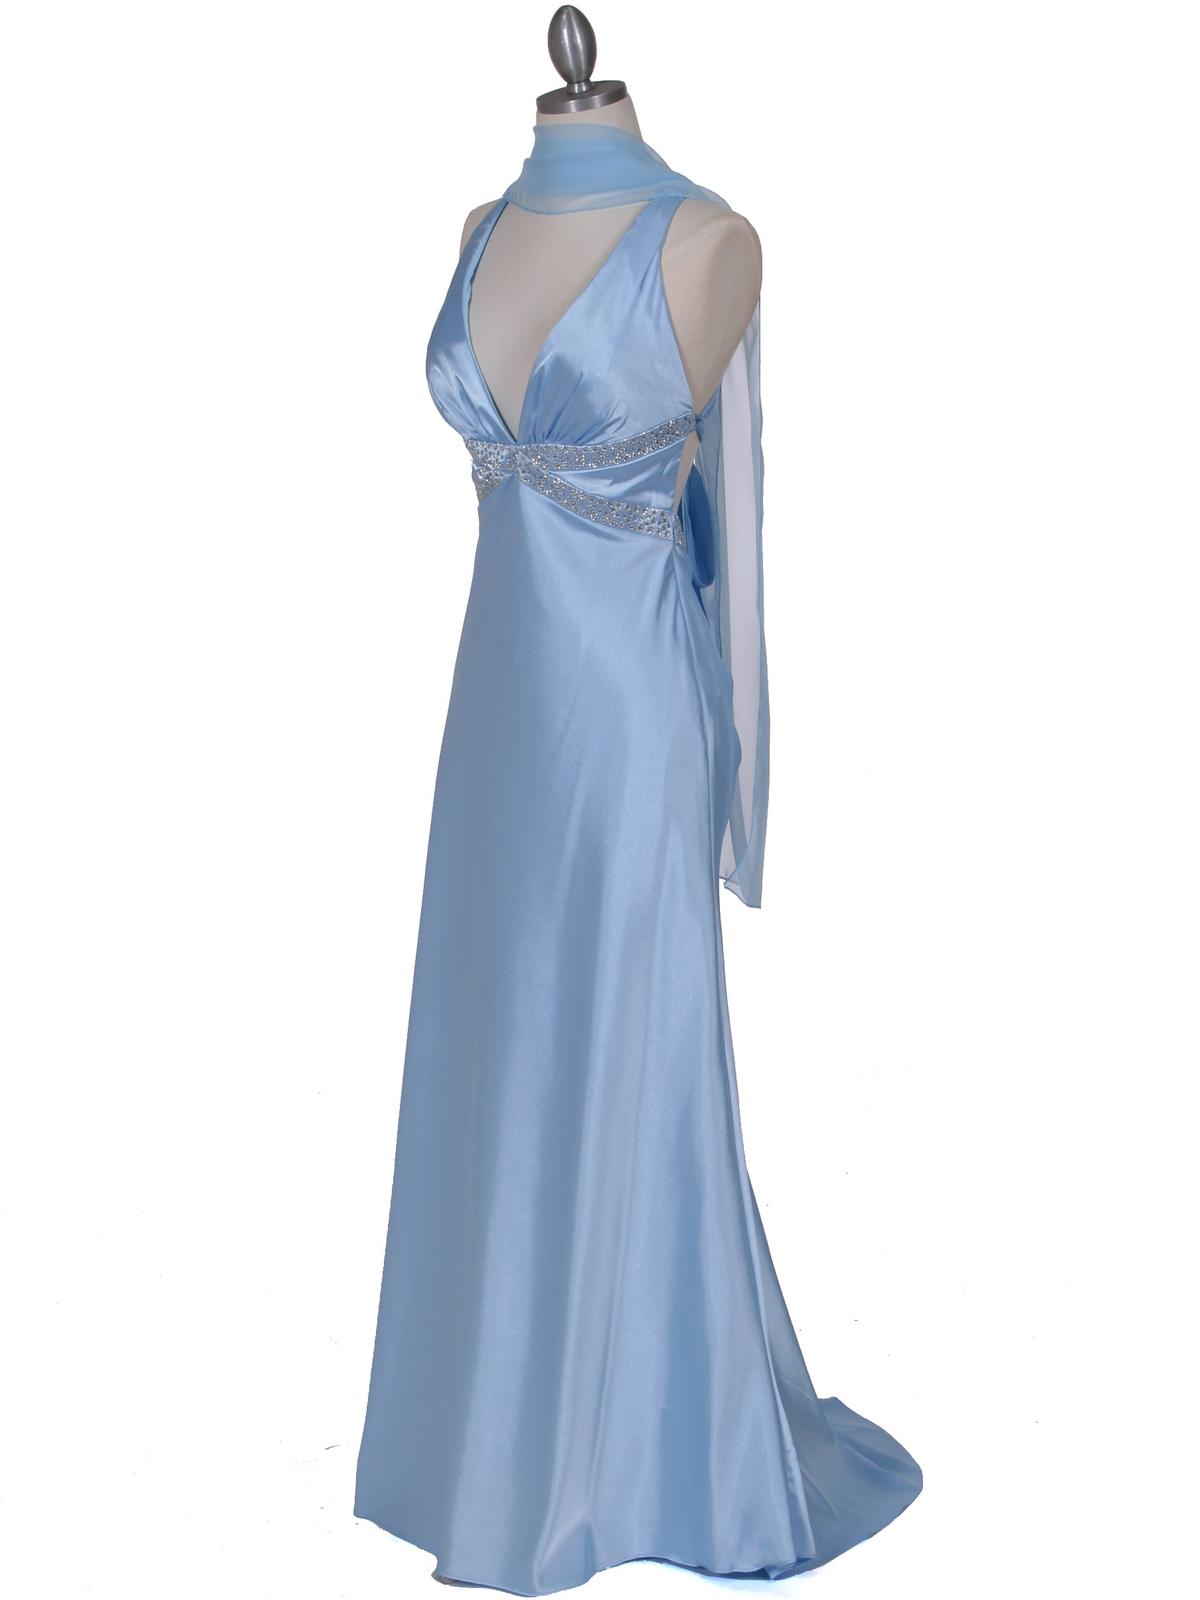 Baby Blue Satin Evening Dress Sung Boutique L A